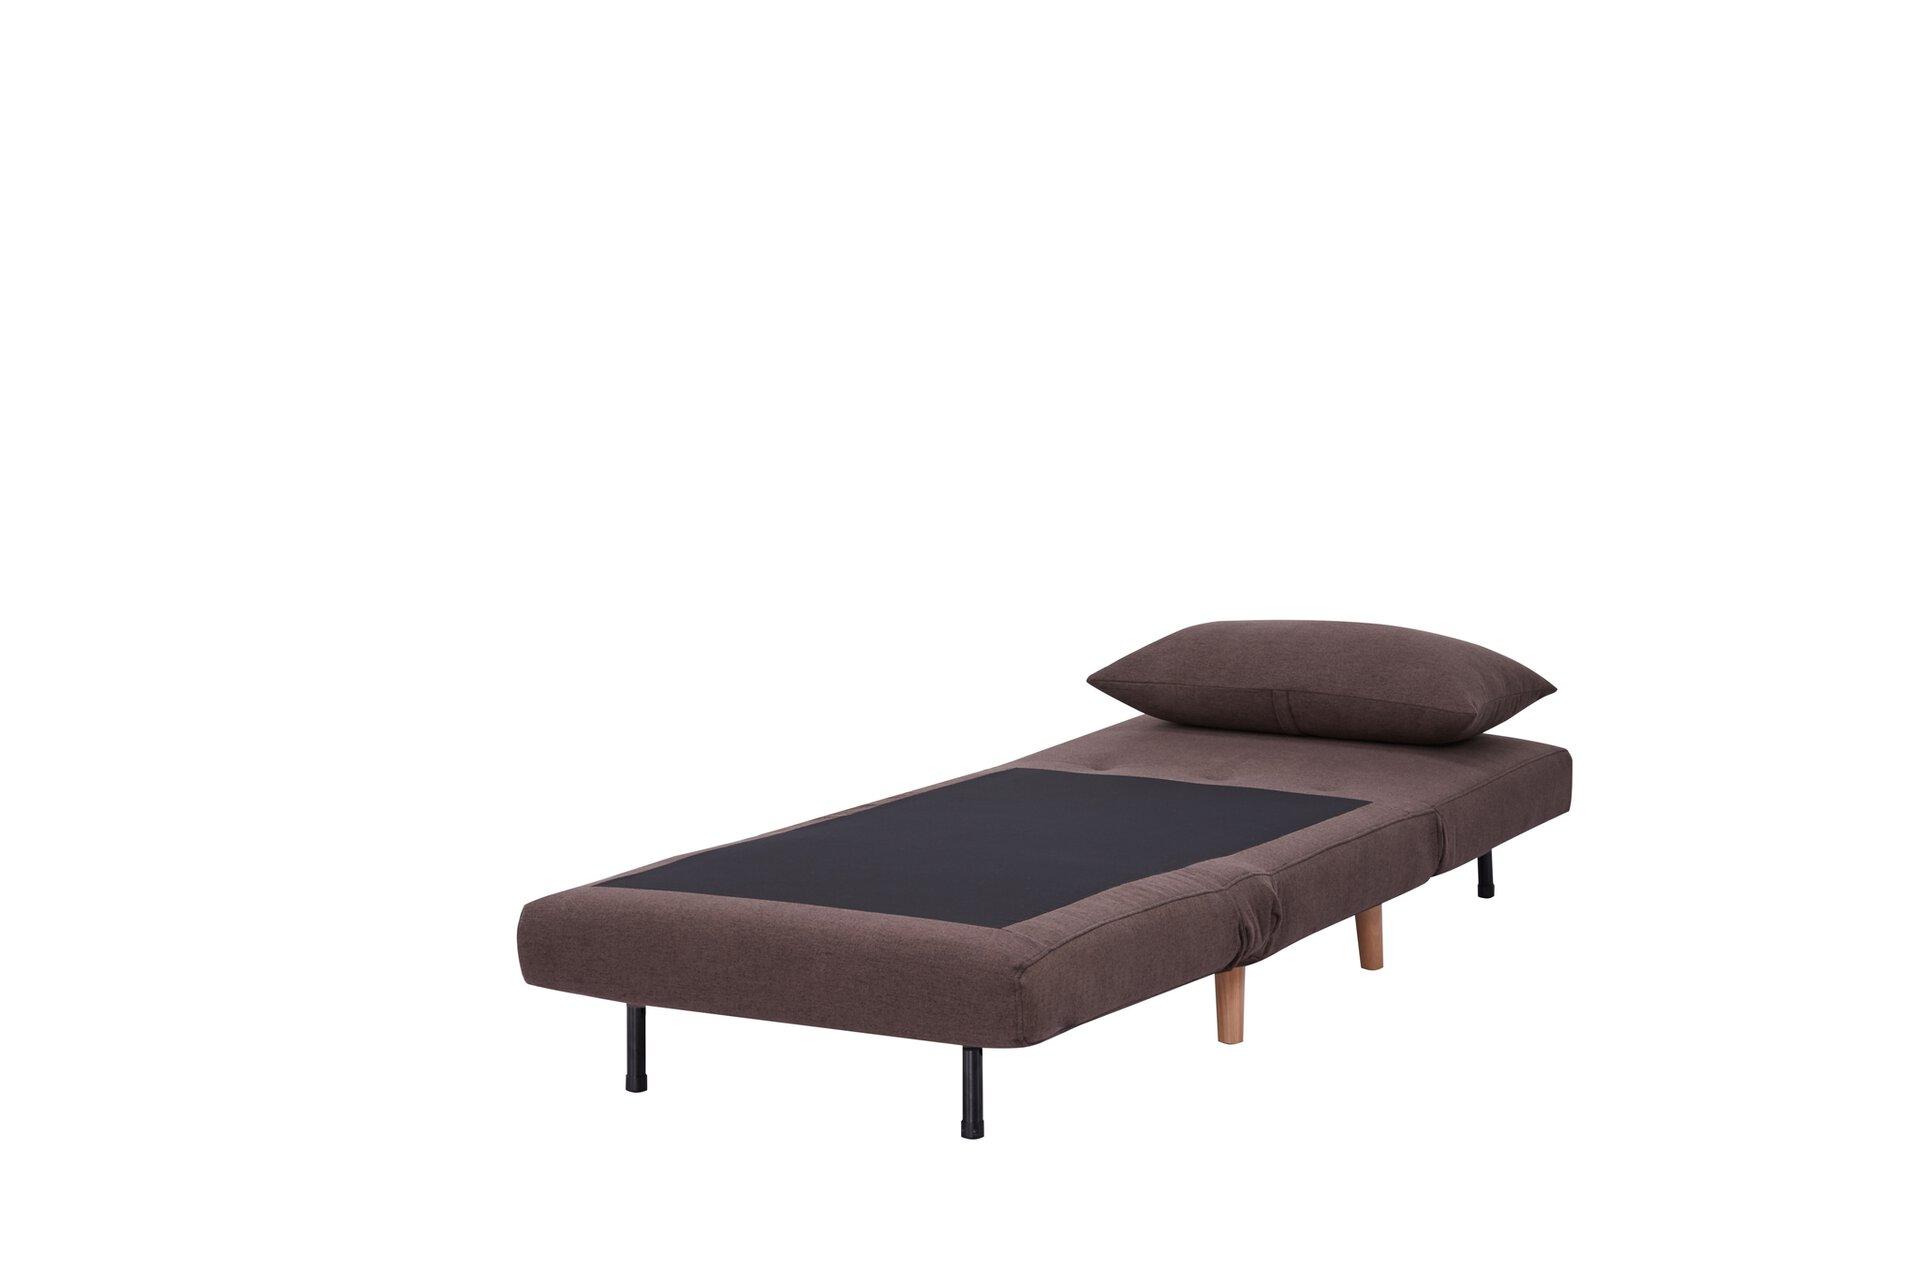 Schlafsessel HKS01 CELECT Textil braun 77 x 81 x 90 cm